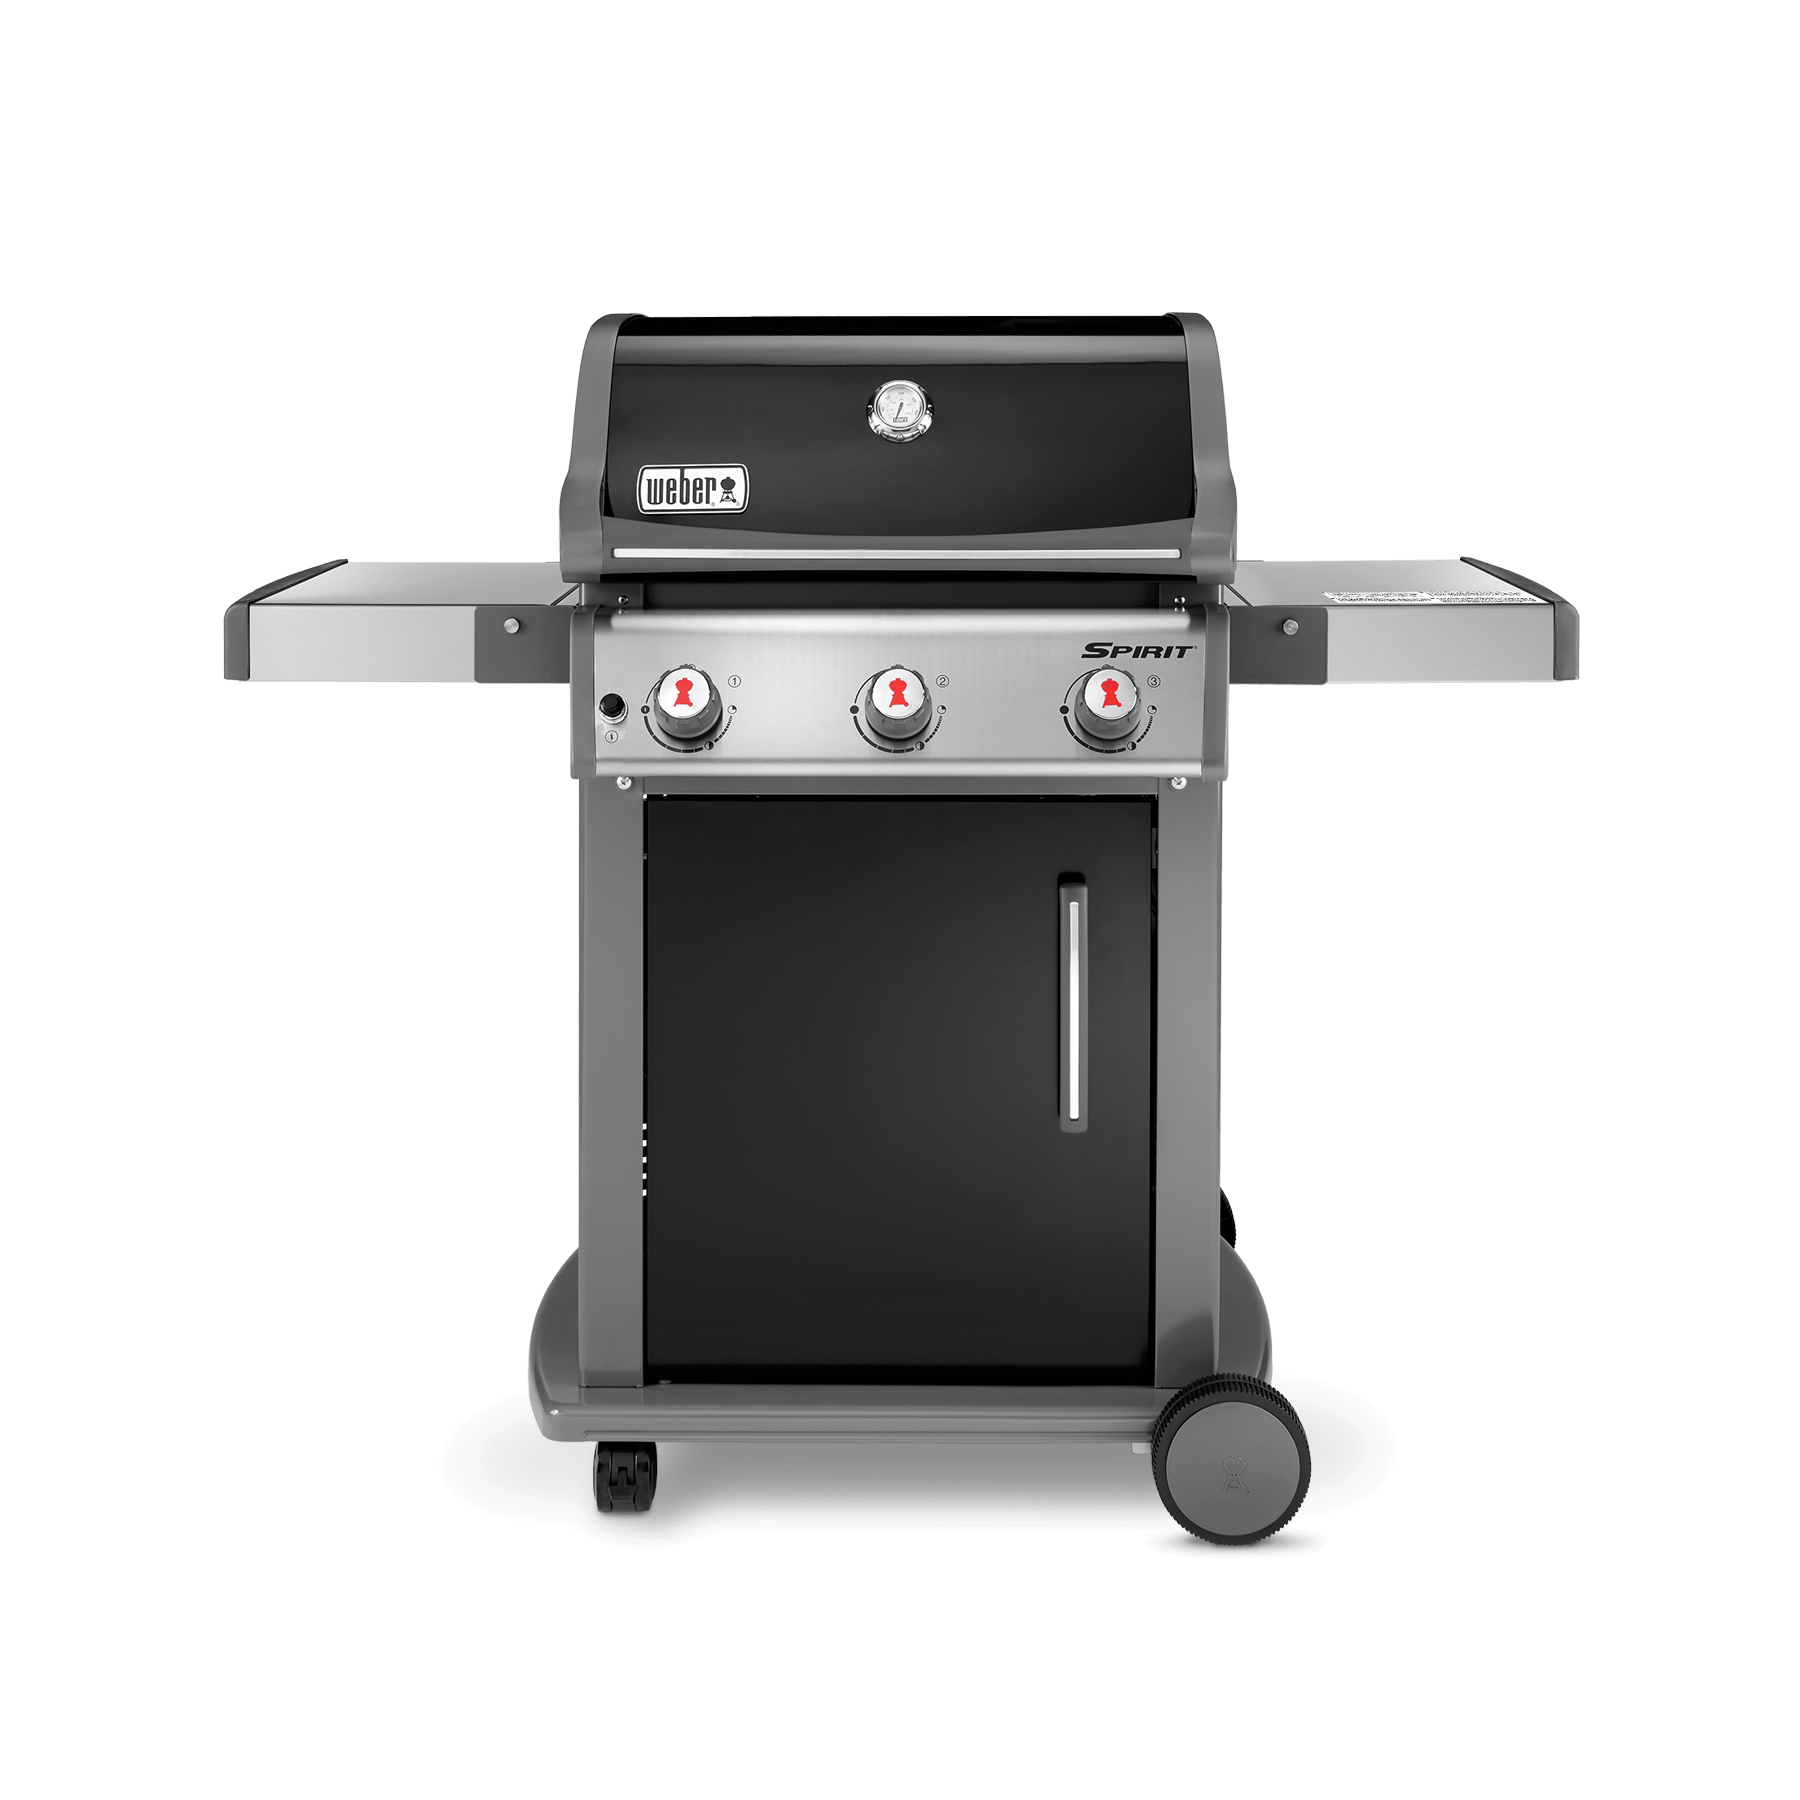 SPIRIT E-310 燃气烤炉